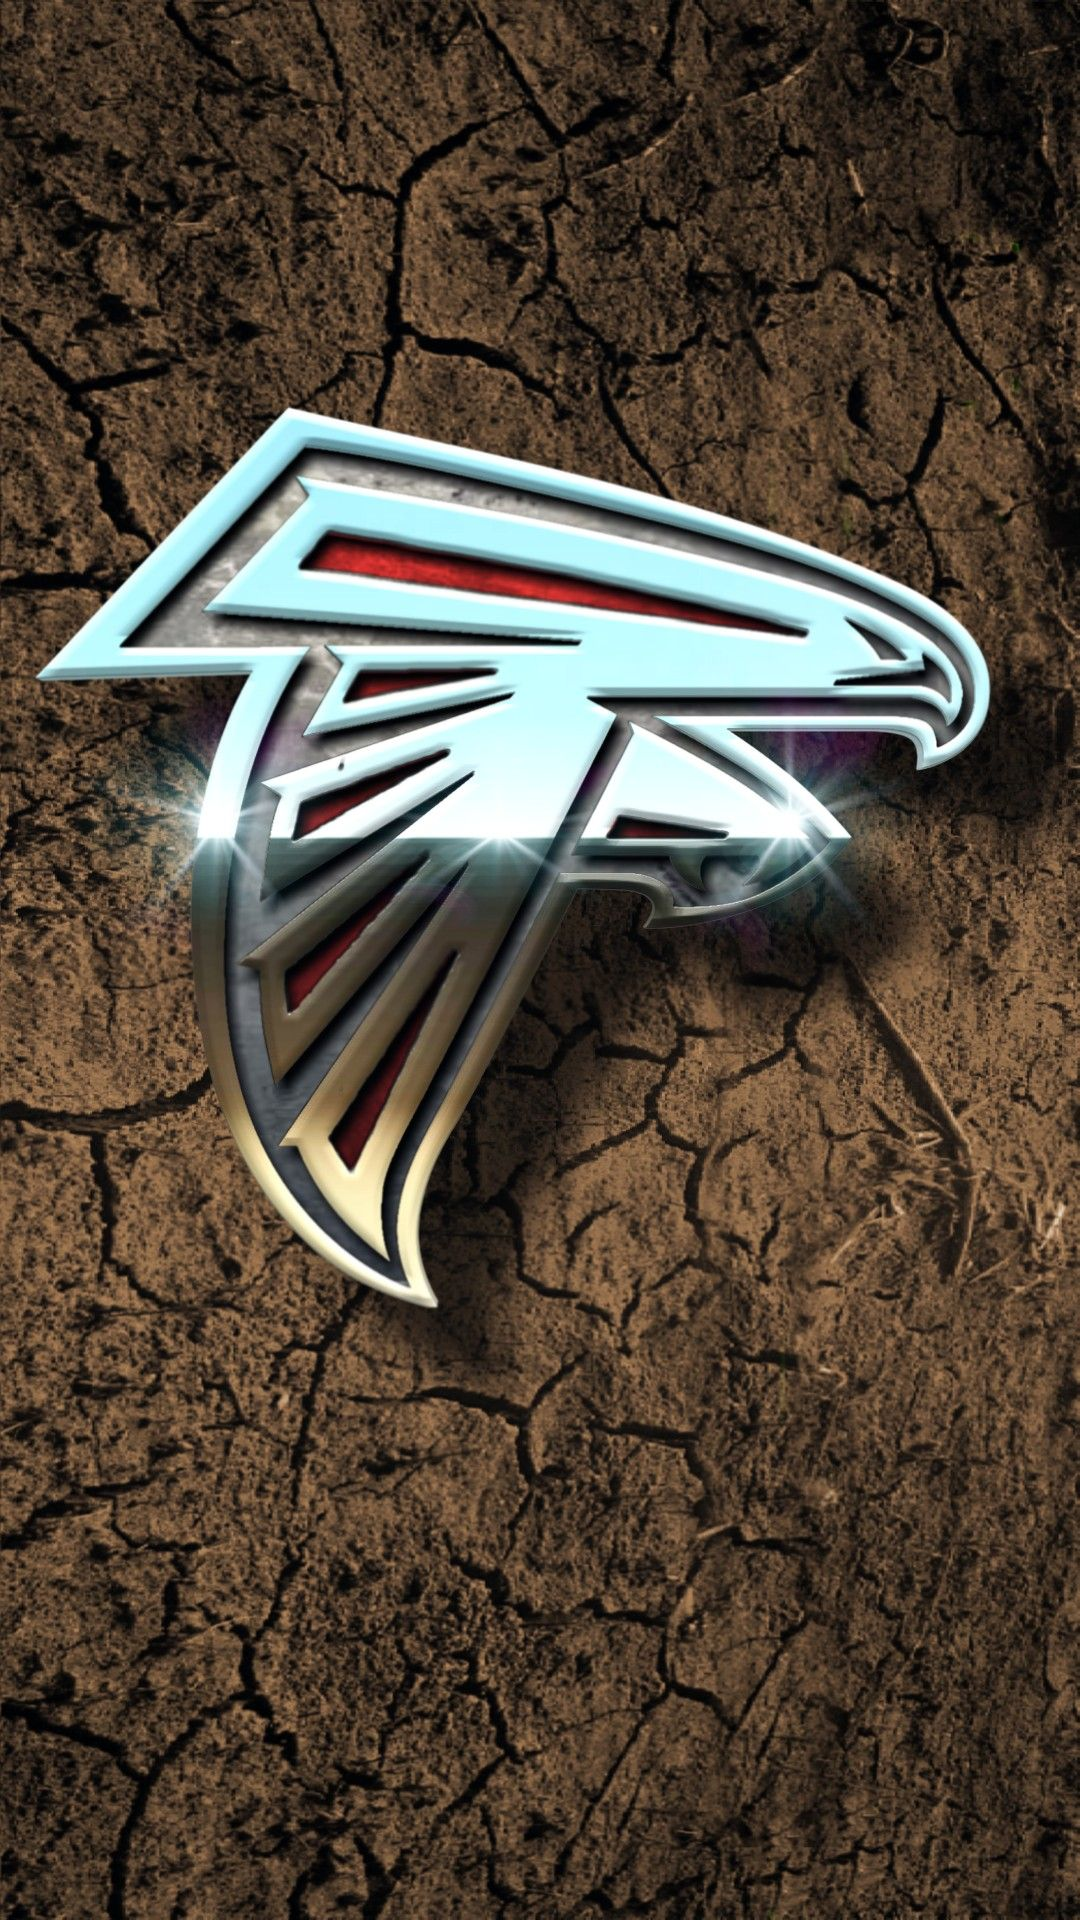 Nfl Atlanta Falcons Logo Wallpaper Atlanta Falcons Wallpaper Atlanta Falcons Football Atlanta Falcons Logo